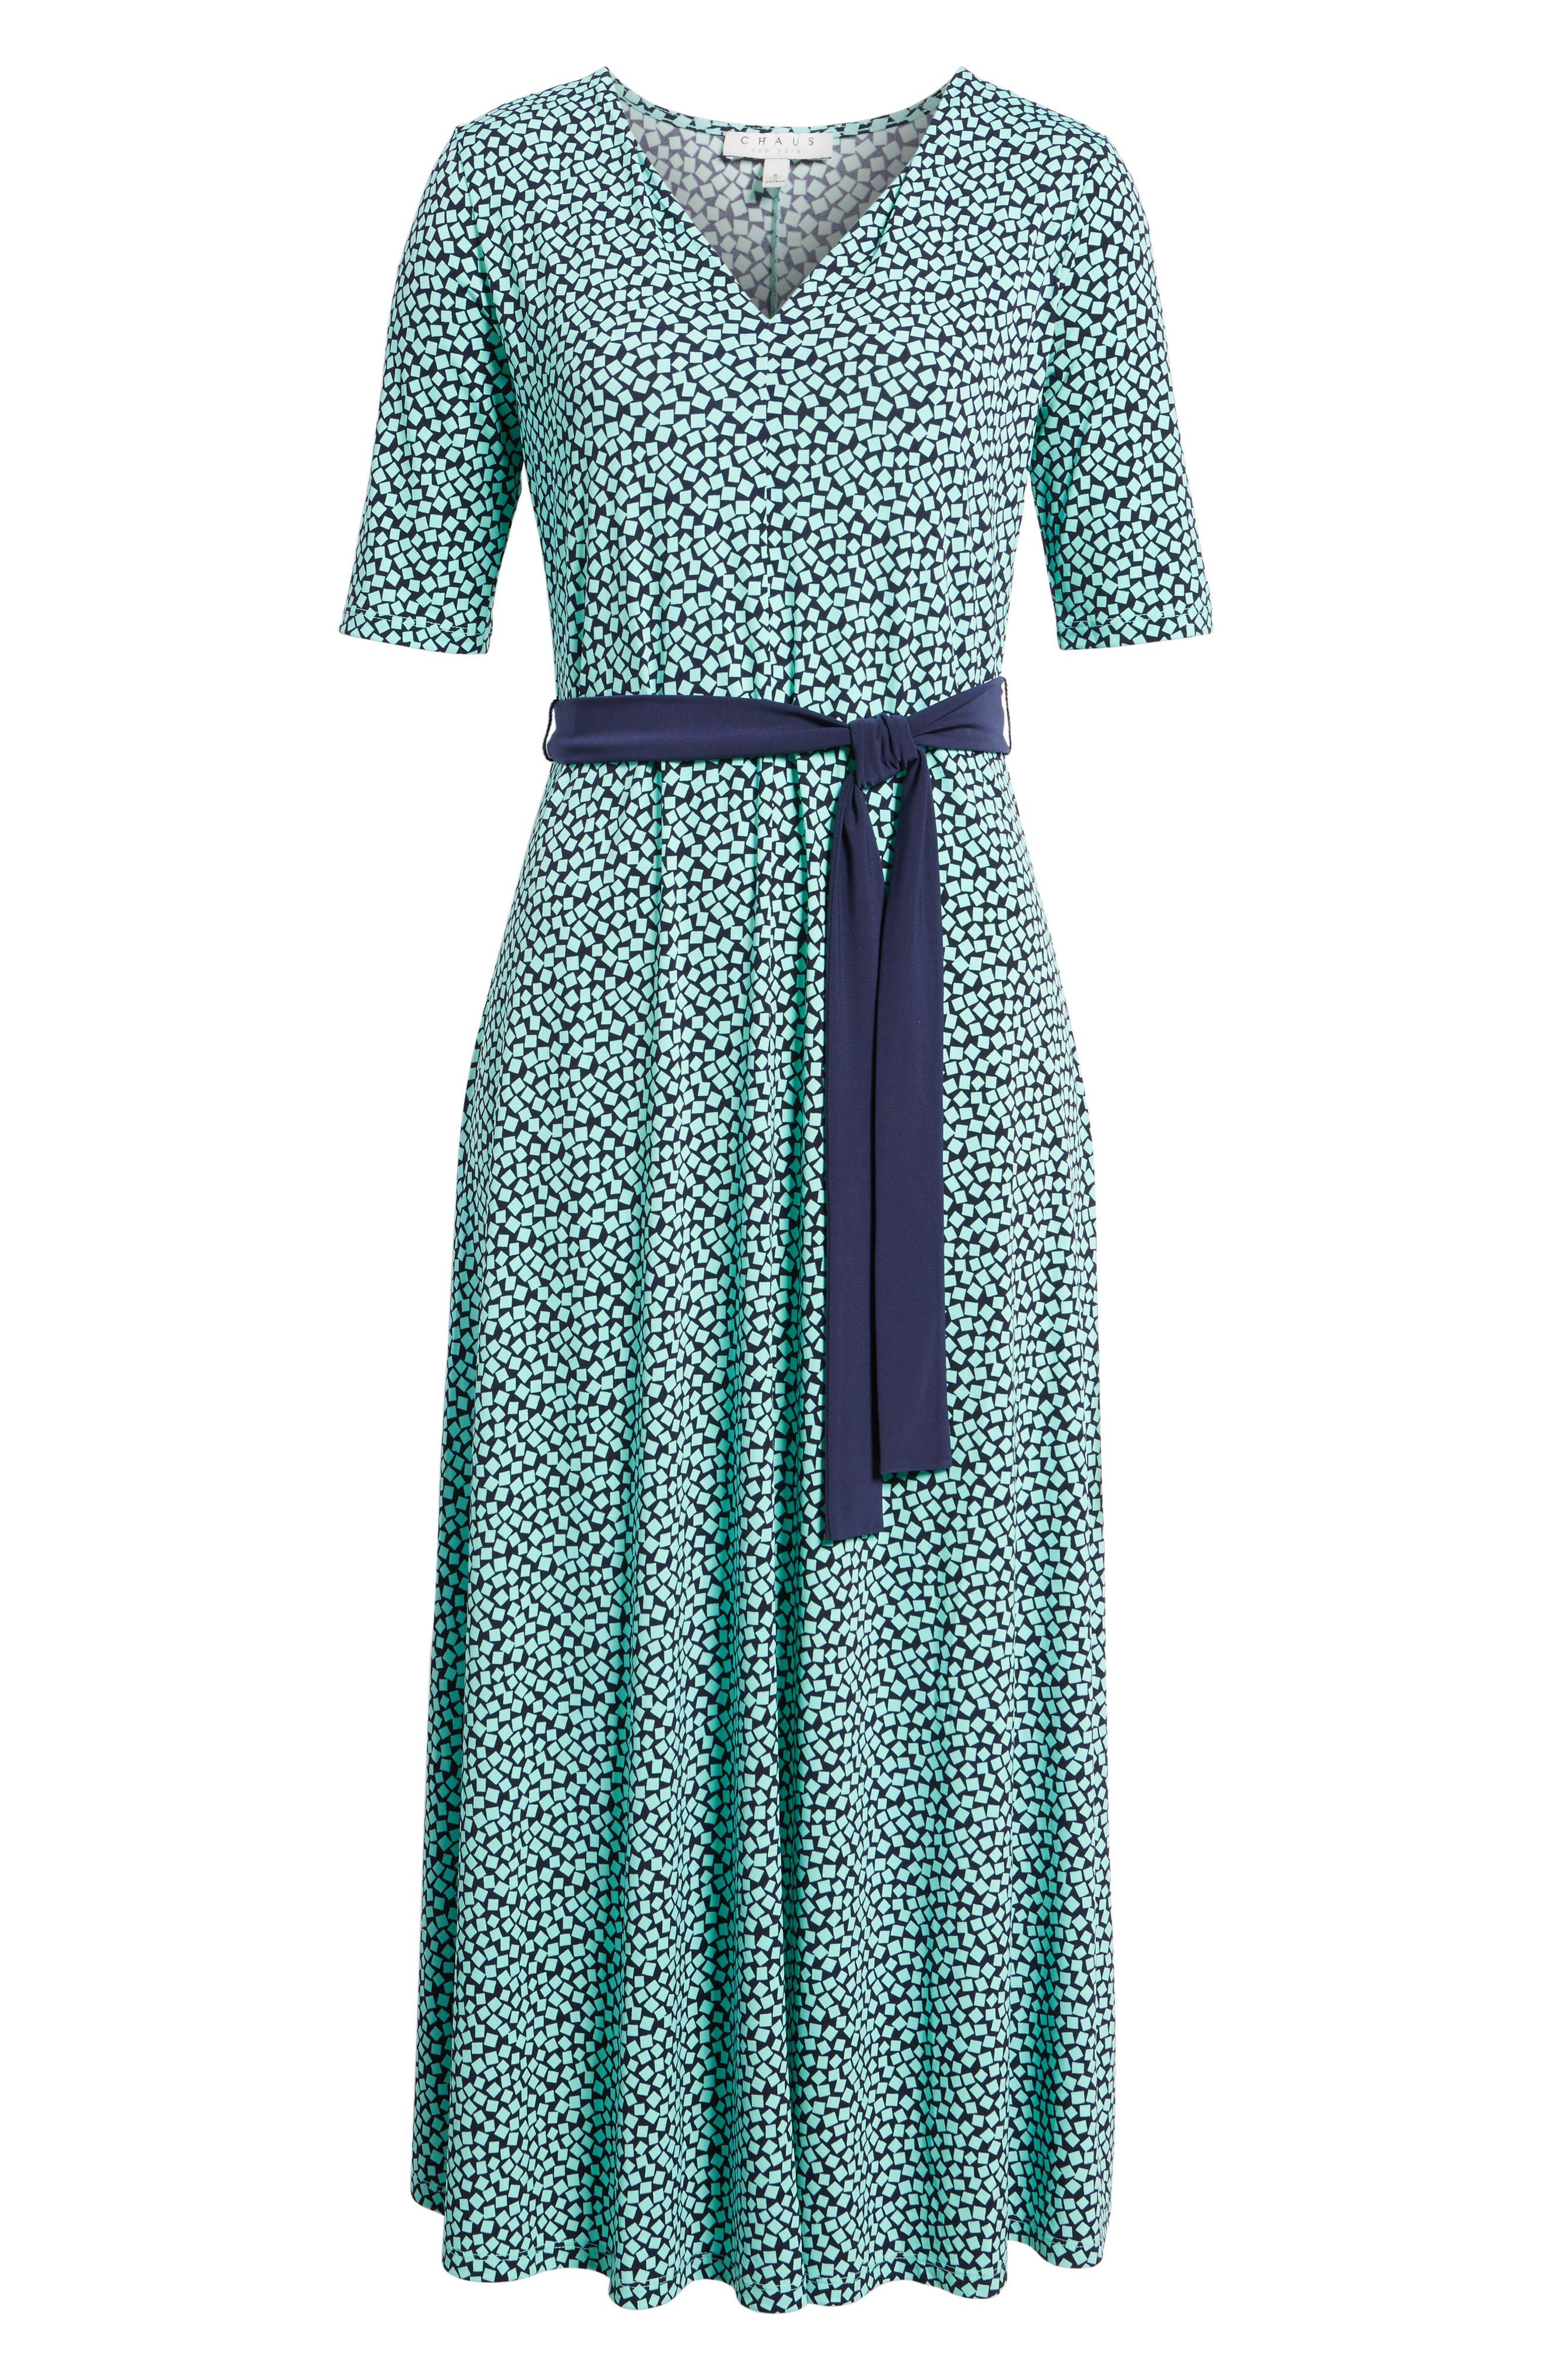 Belted Cube Print Midi Dress,                             Alternate thumbnail 6, color,                             Sea Glass